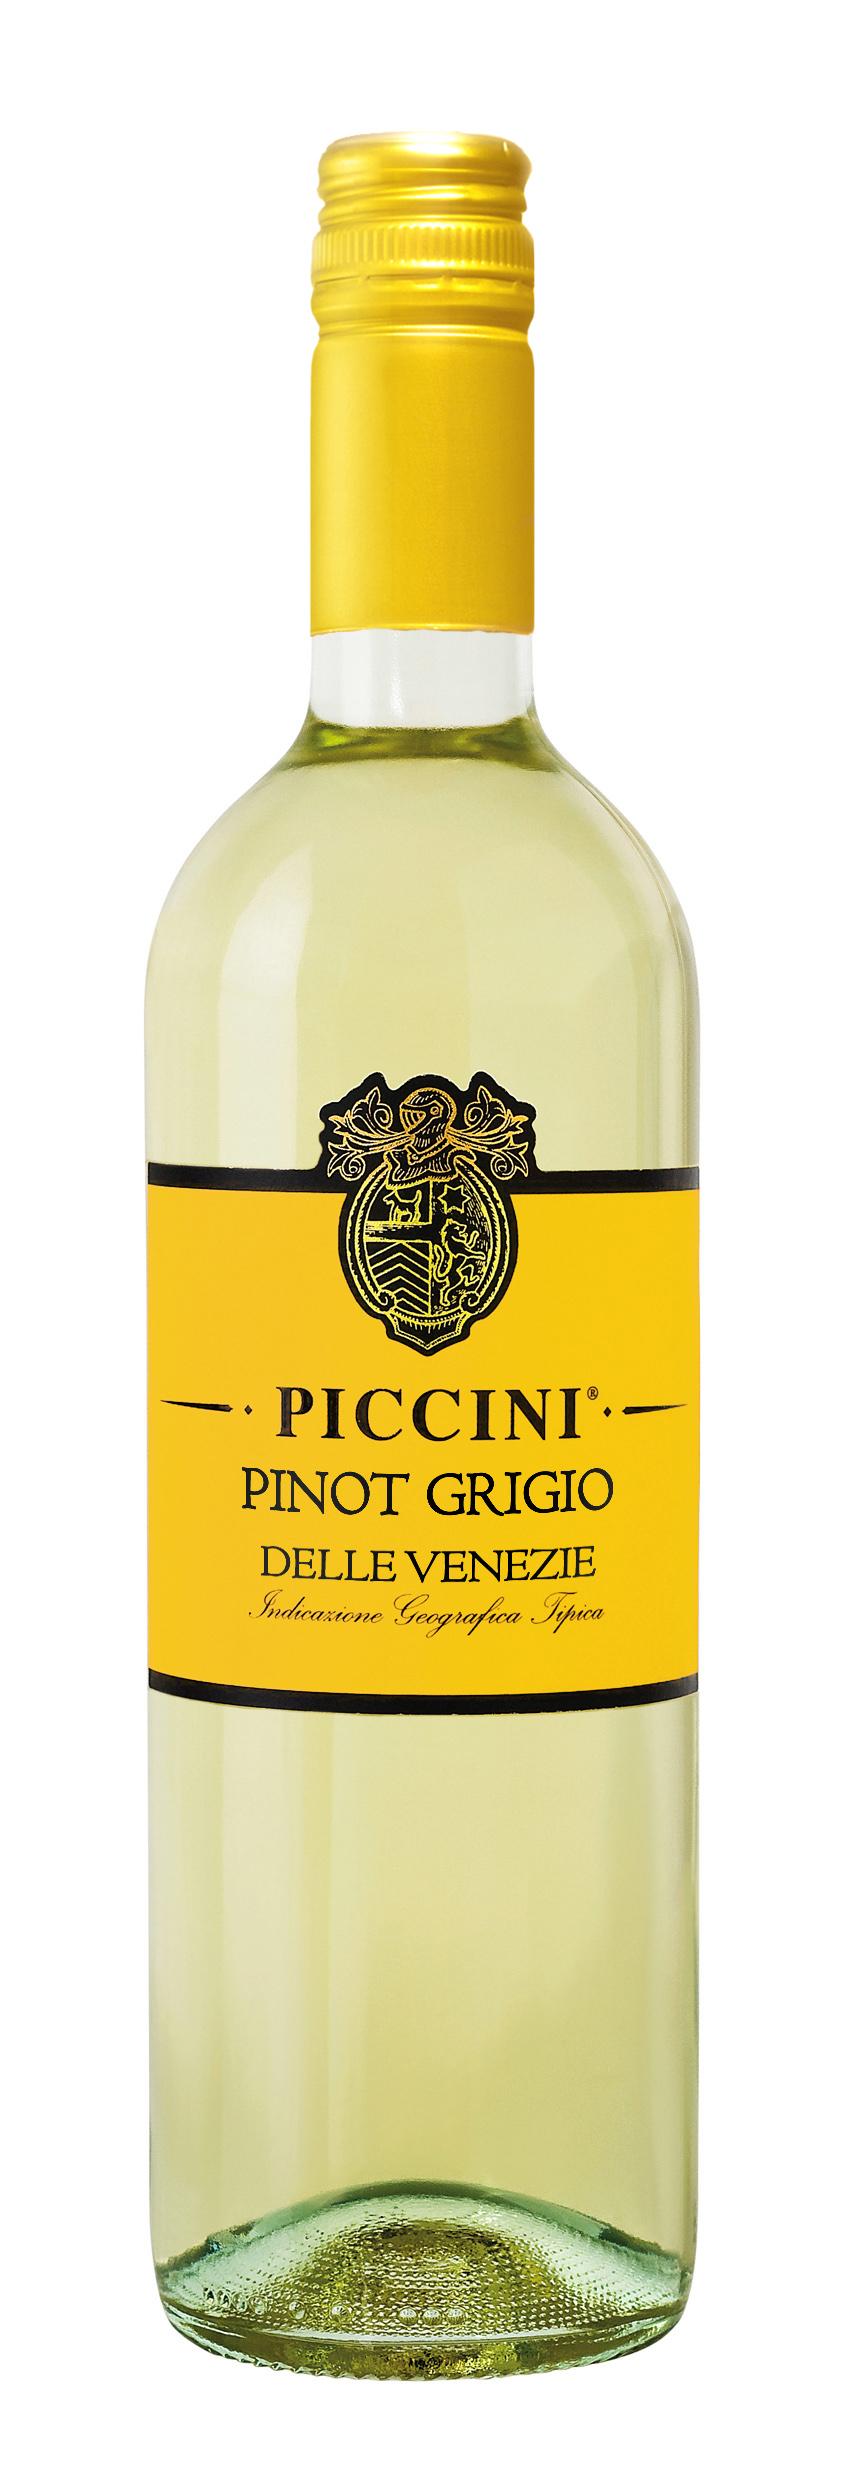 Pinot Gris image